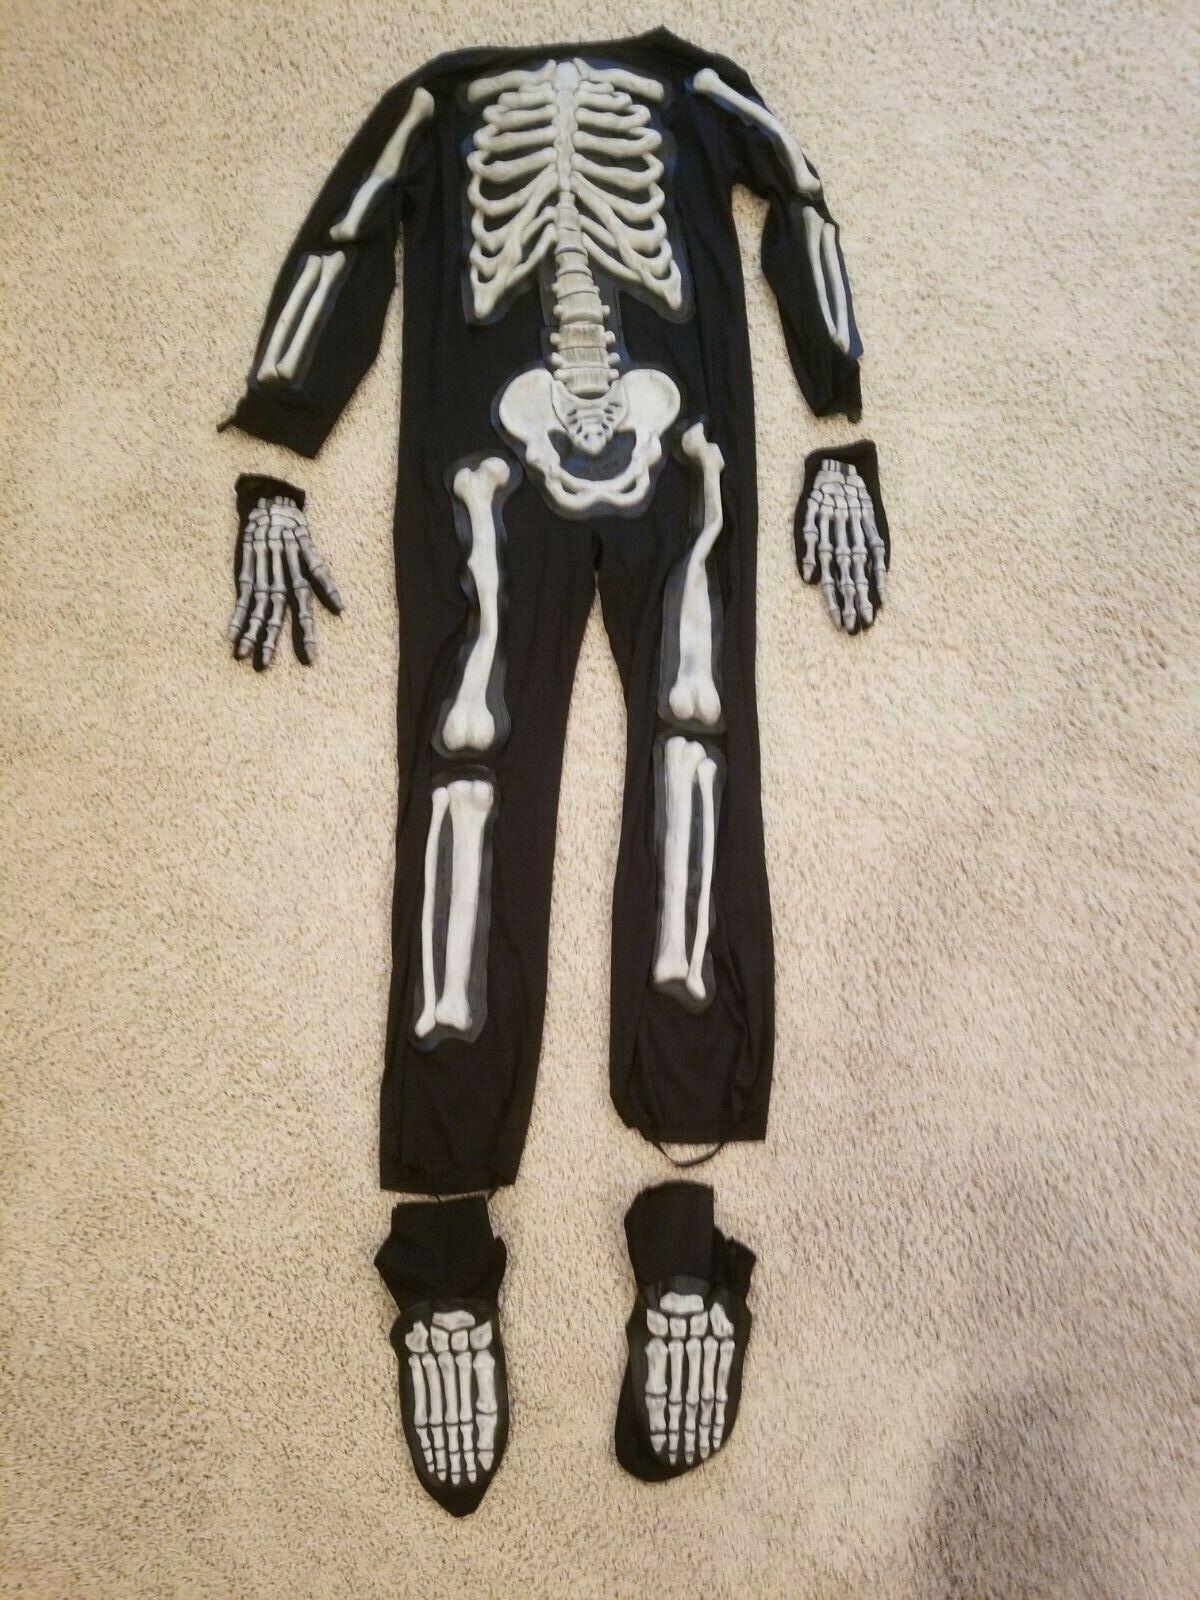 Kids Size (8-10) Medium 3D Skeleton Halloween Costume